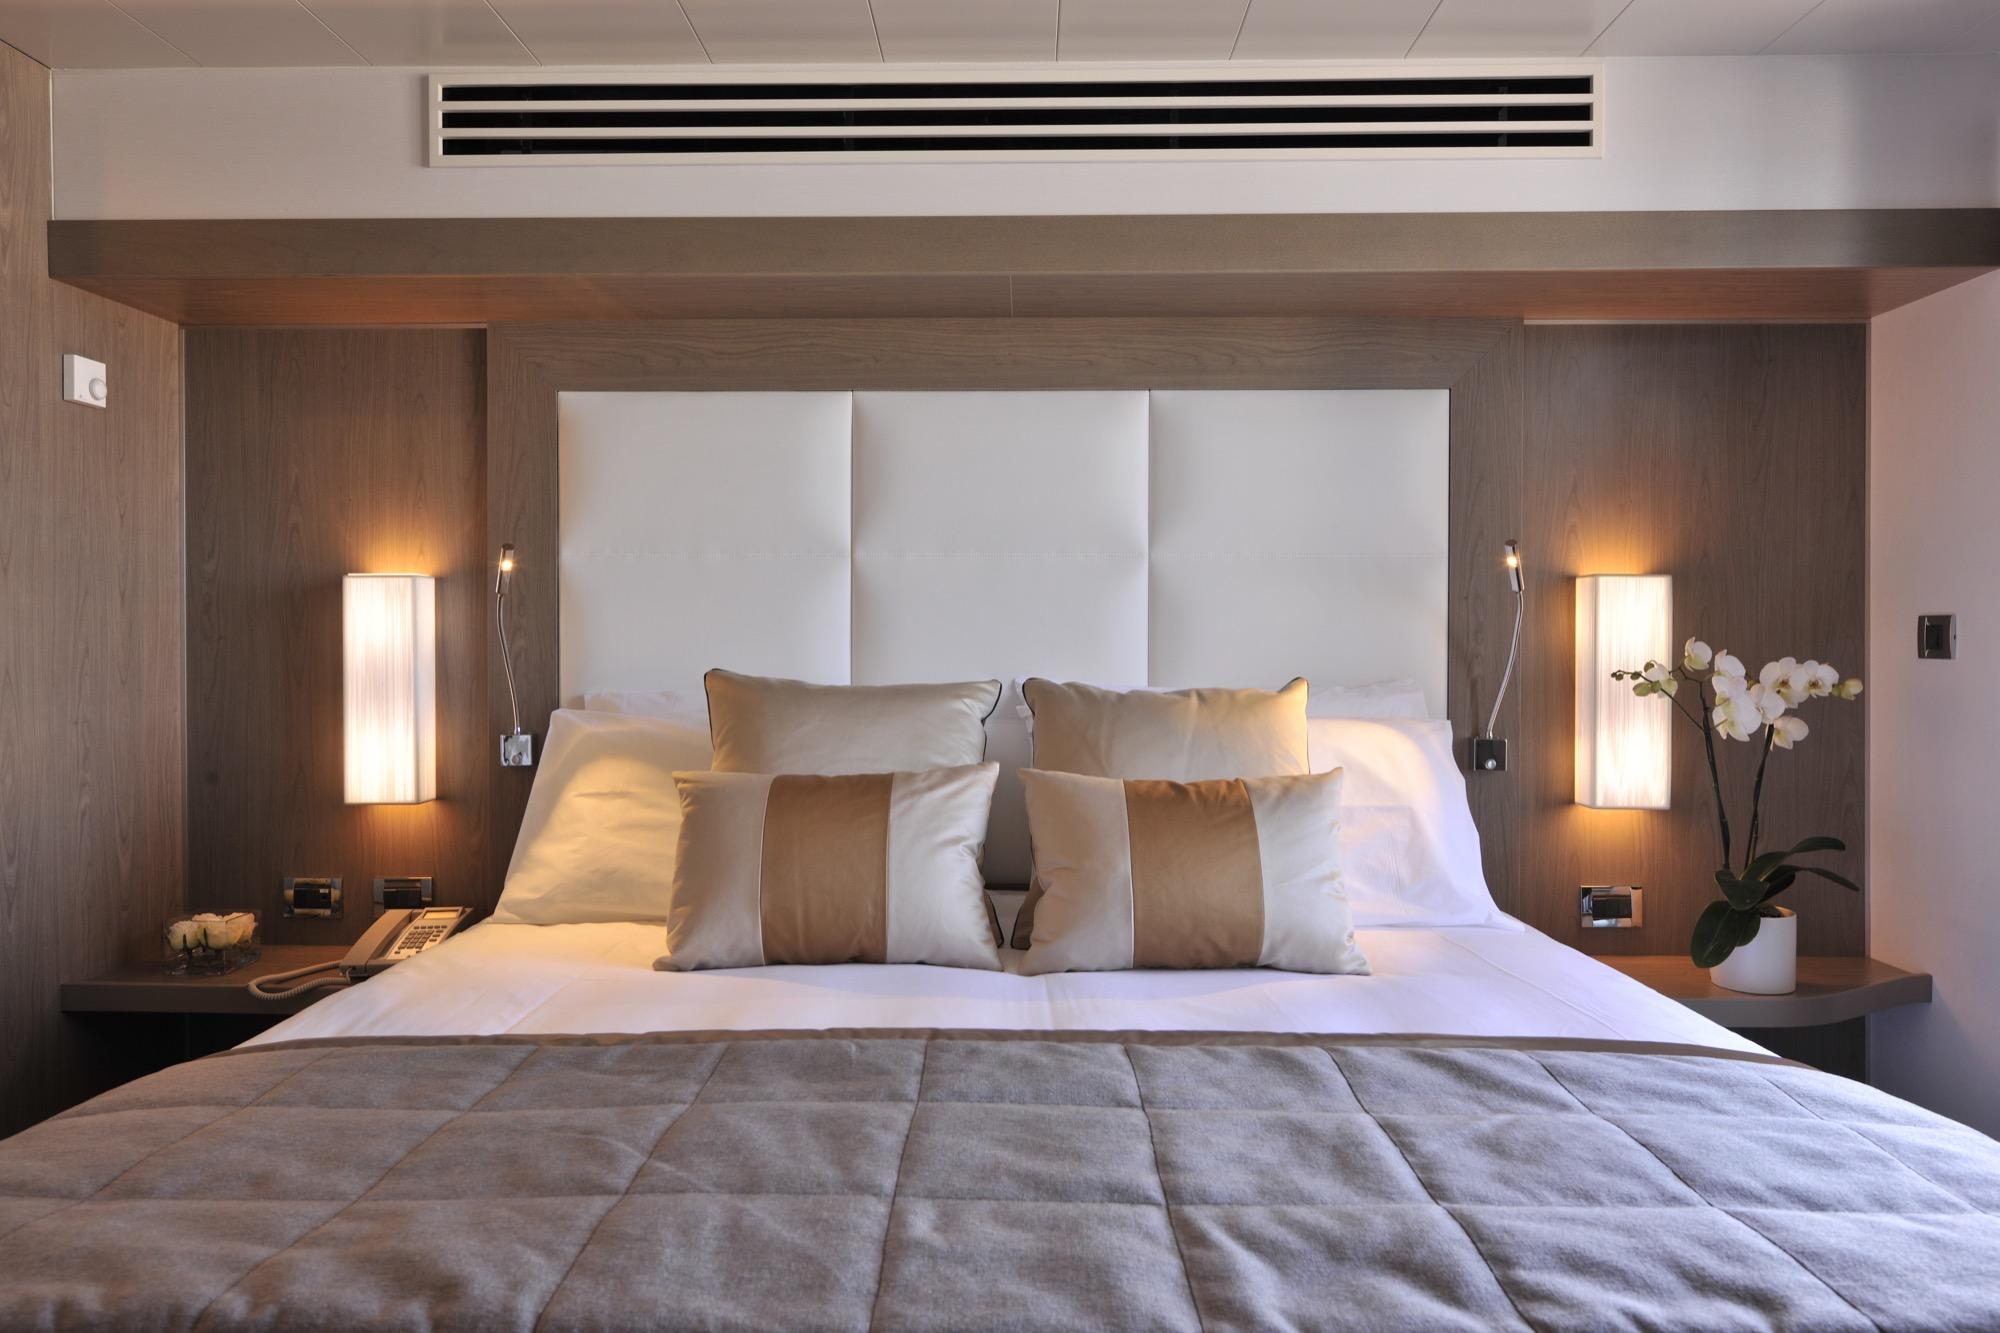 Ponant Le Boreal Accommodation Prestige Stateroom 2.JPEG